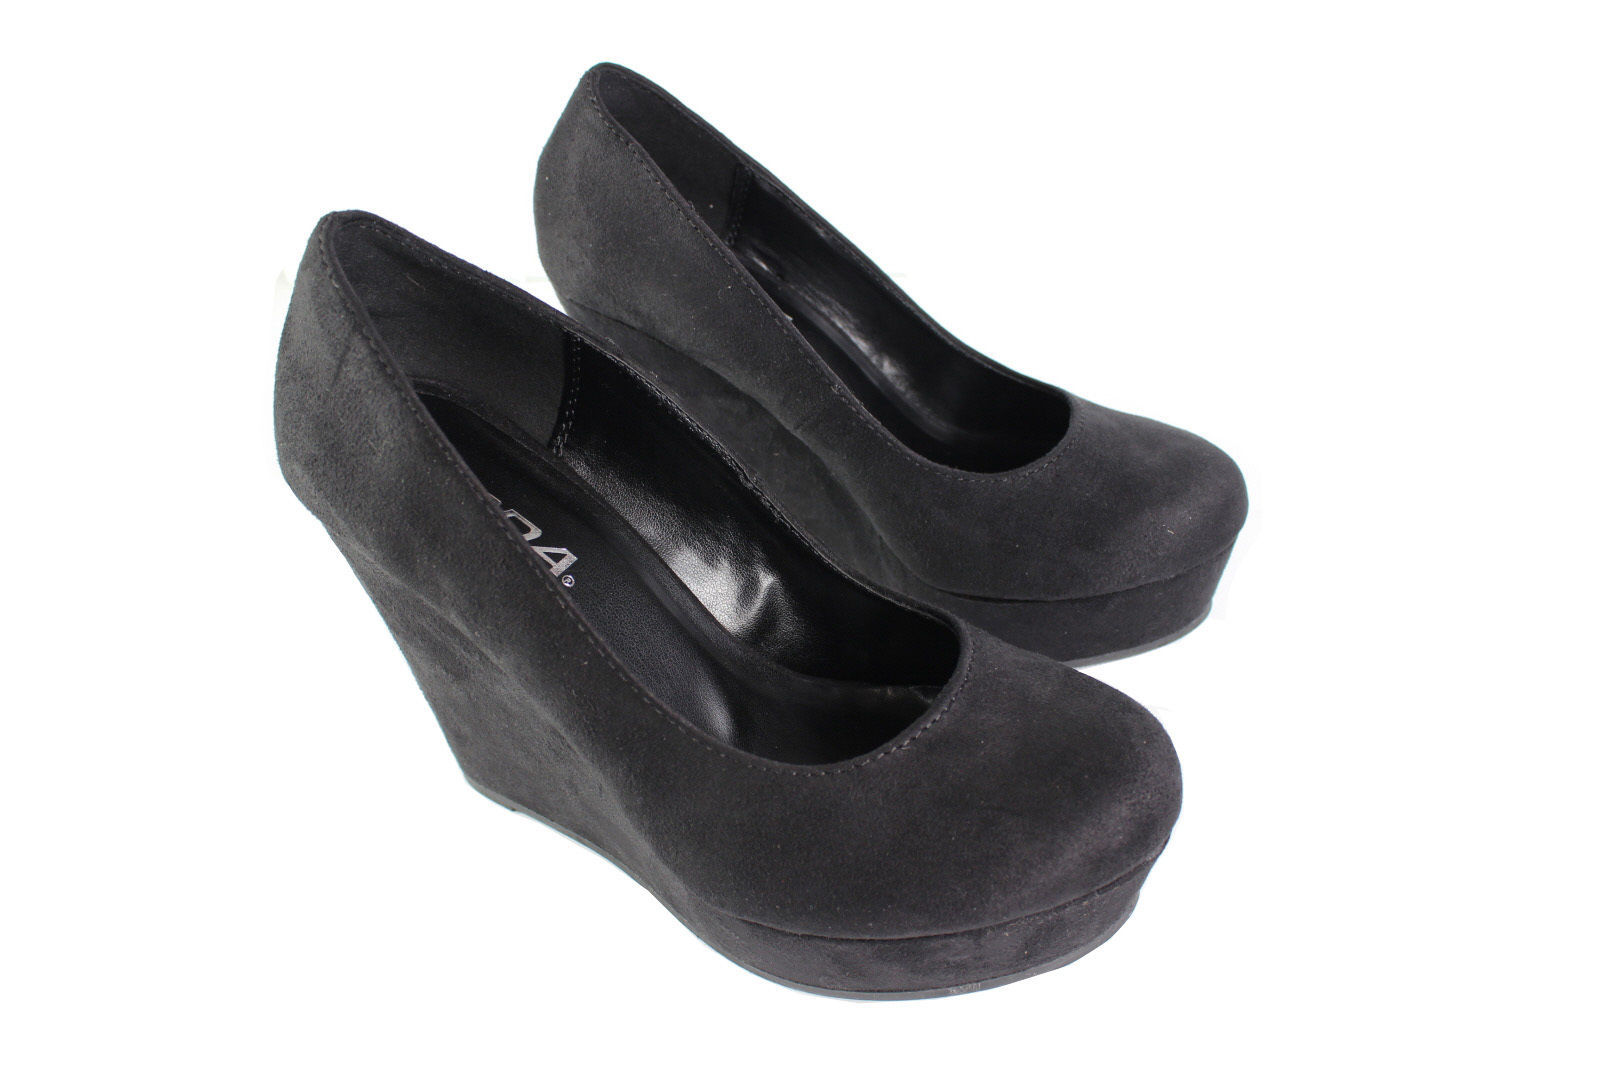 93d0c3bddf4e6 Soda Women s Sexy Platform Wedge SANDAL High Heel Pump Shoes Suede Size  5.5-10 -  24.99